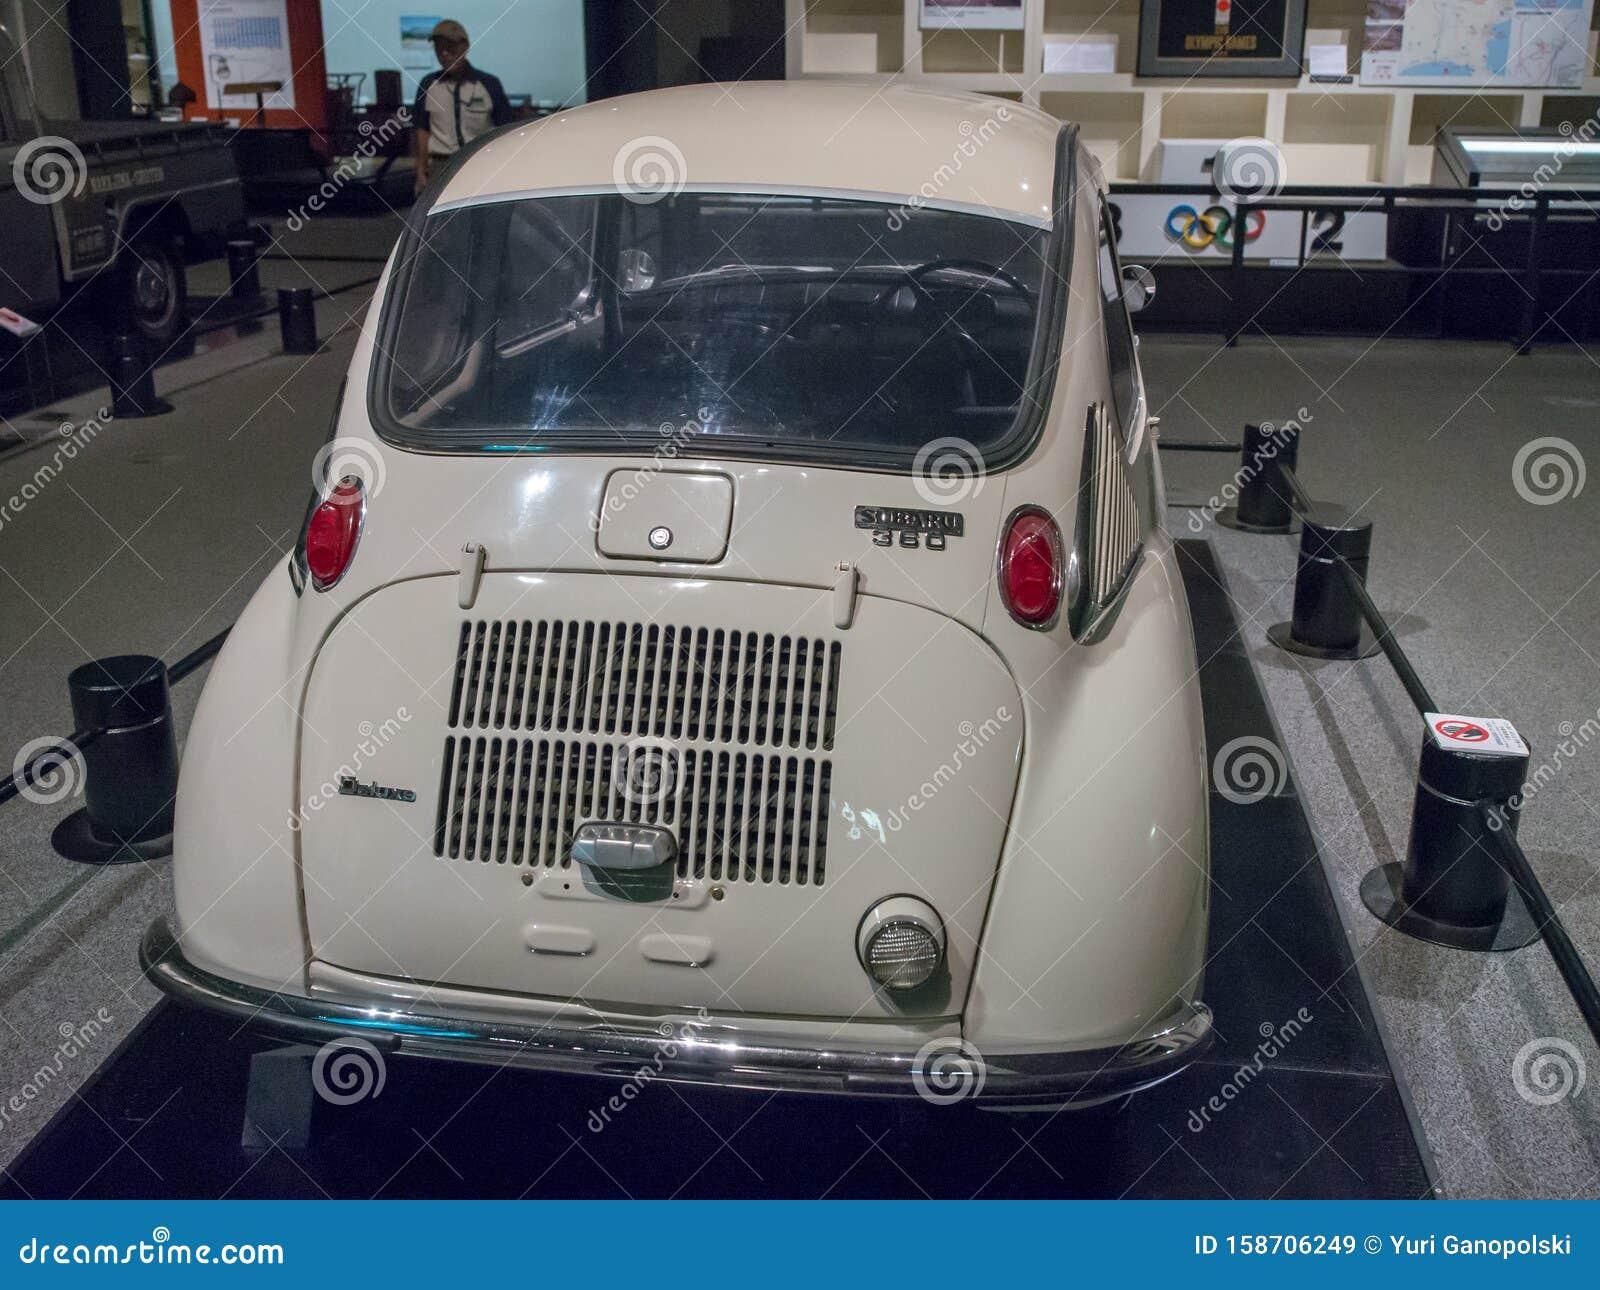 The First Japanese Light Car Subaru 360 At Edo-Tokyo ...